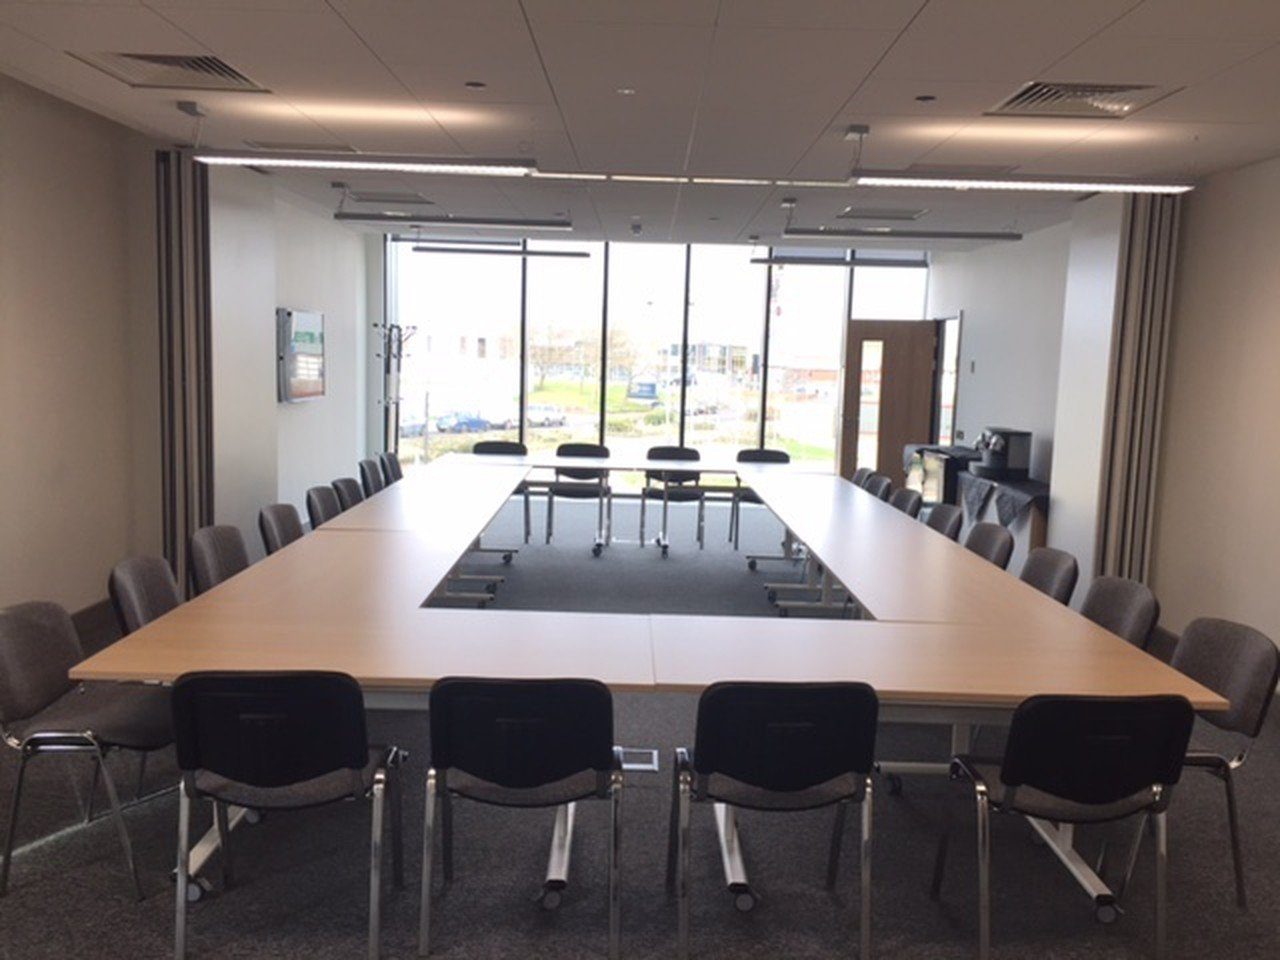 Birmingham seminar rooms Salle de réunion Universities Centre - Room A&B image 1